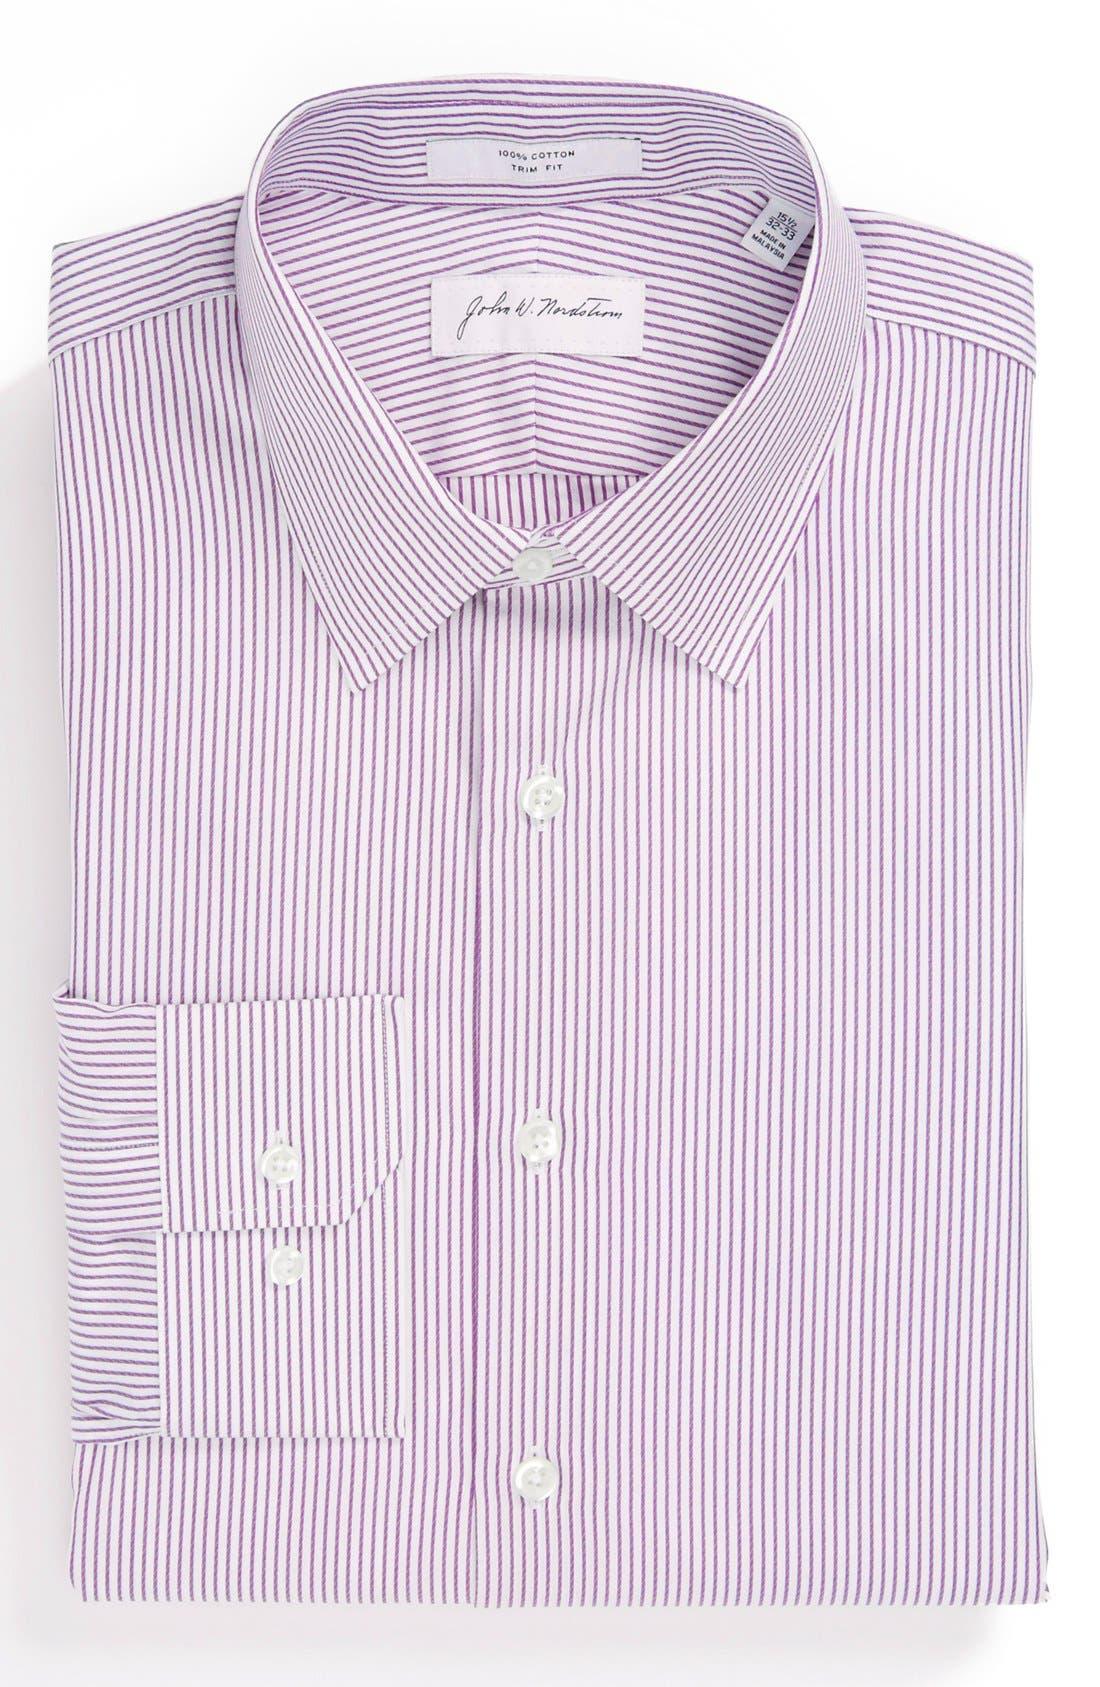 Alternate Image 1 Selected - John W. Nordstrom Trim Fit Stripe Dress Shirt